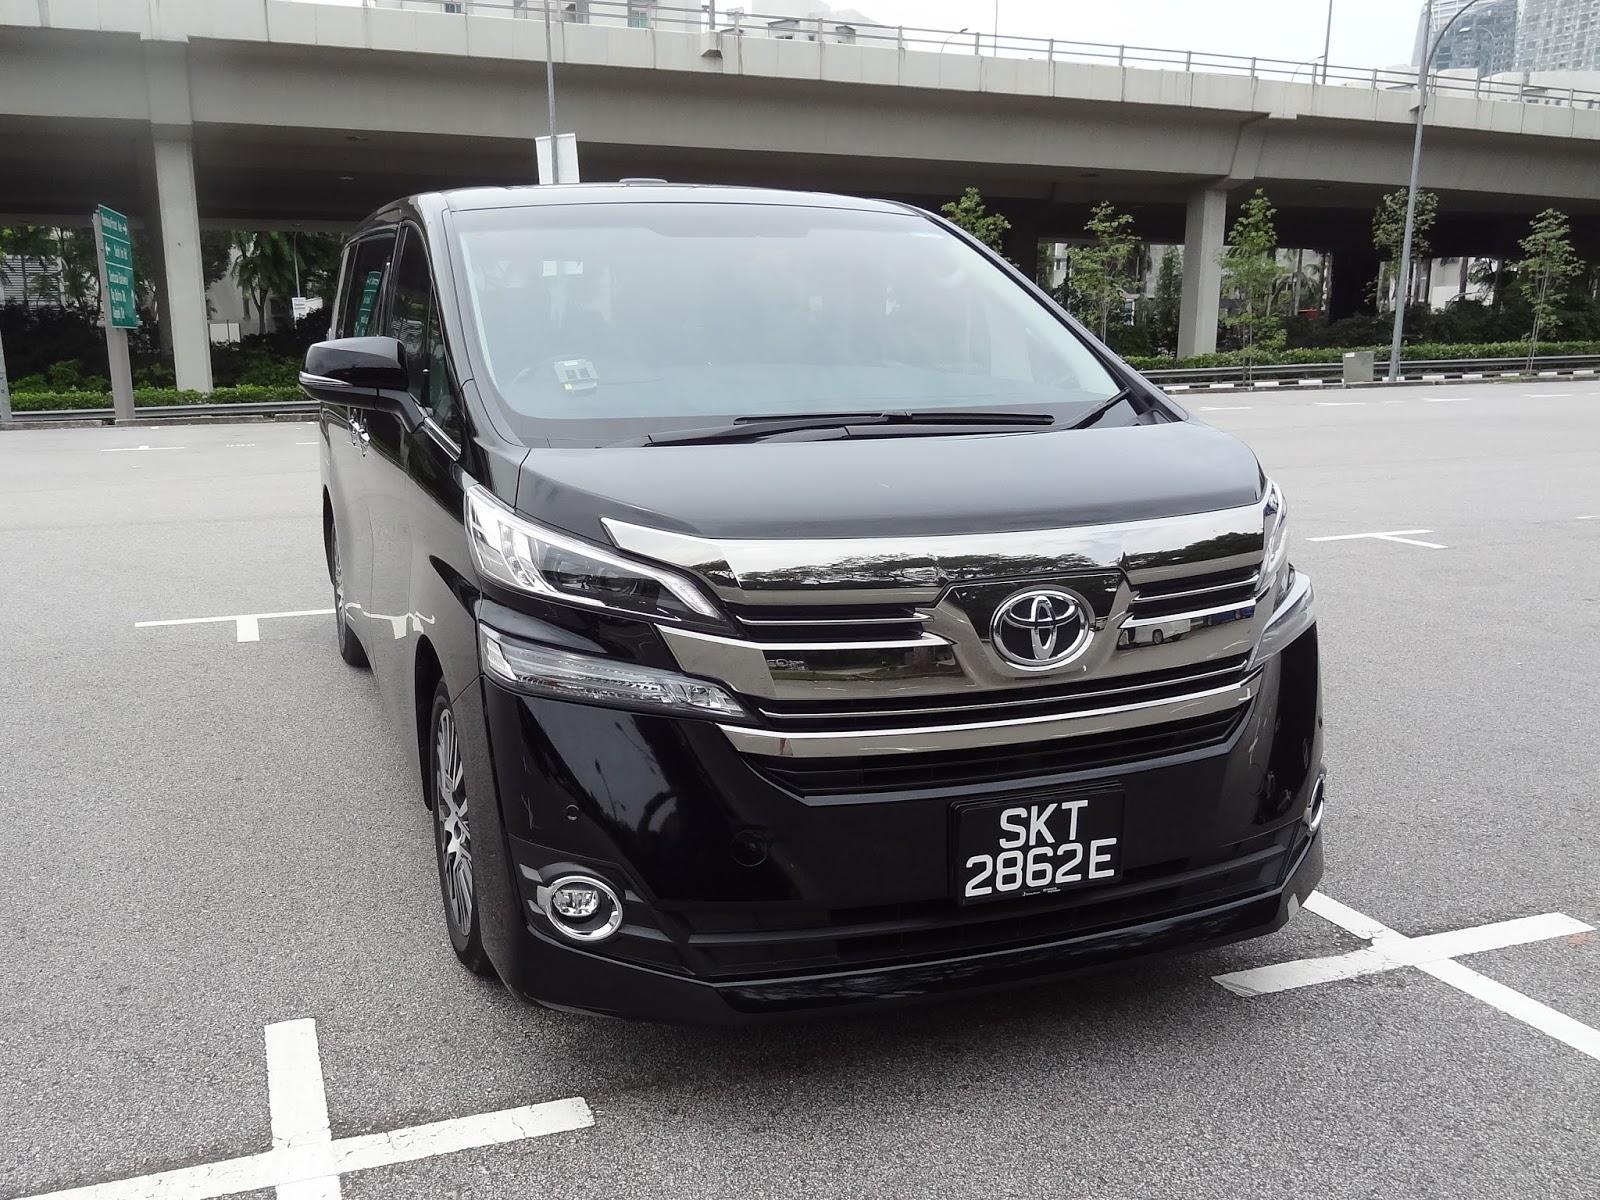 Shaun Owyeong: Toyota Vellfire 2.5 Elegance [Car Review]